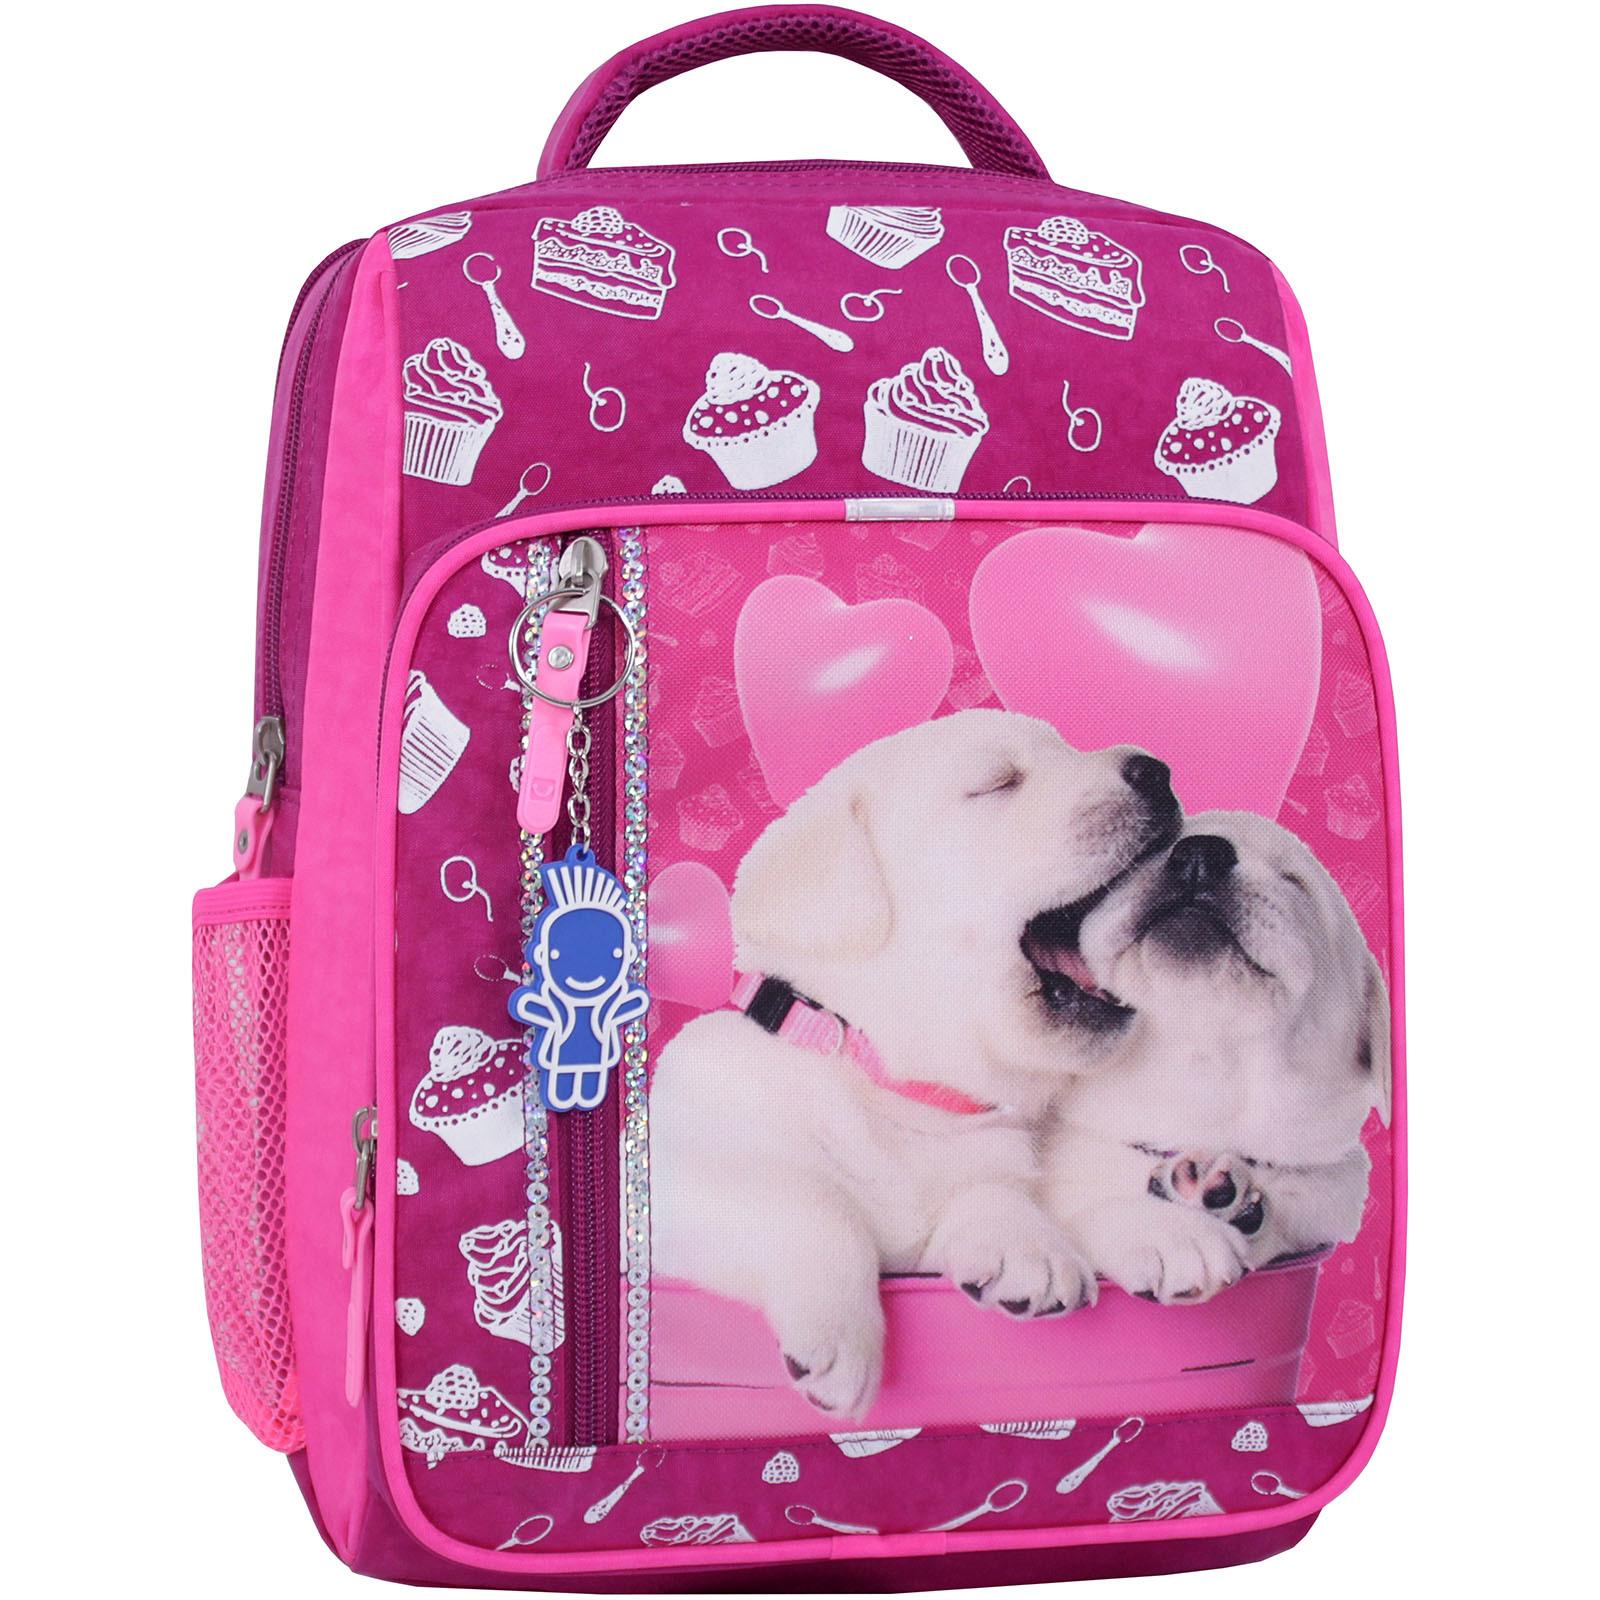 Школьные рюкзаки Рюкзак школьный Bagland Школьник 8 л. 143 малиновый 593 (0012870) IMG_0729_суб.593_.JPG